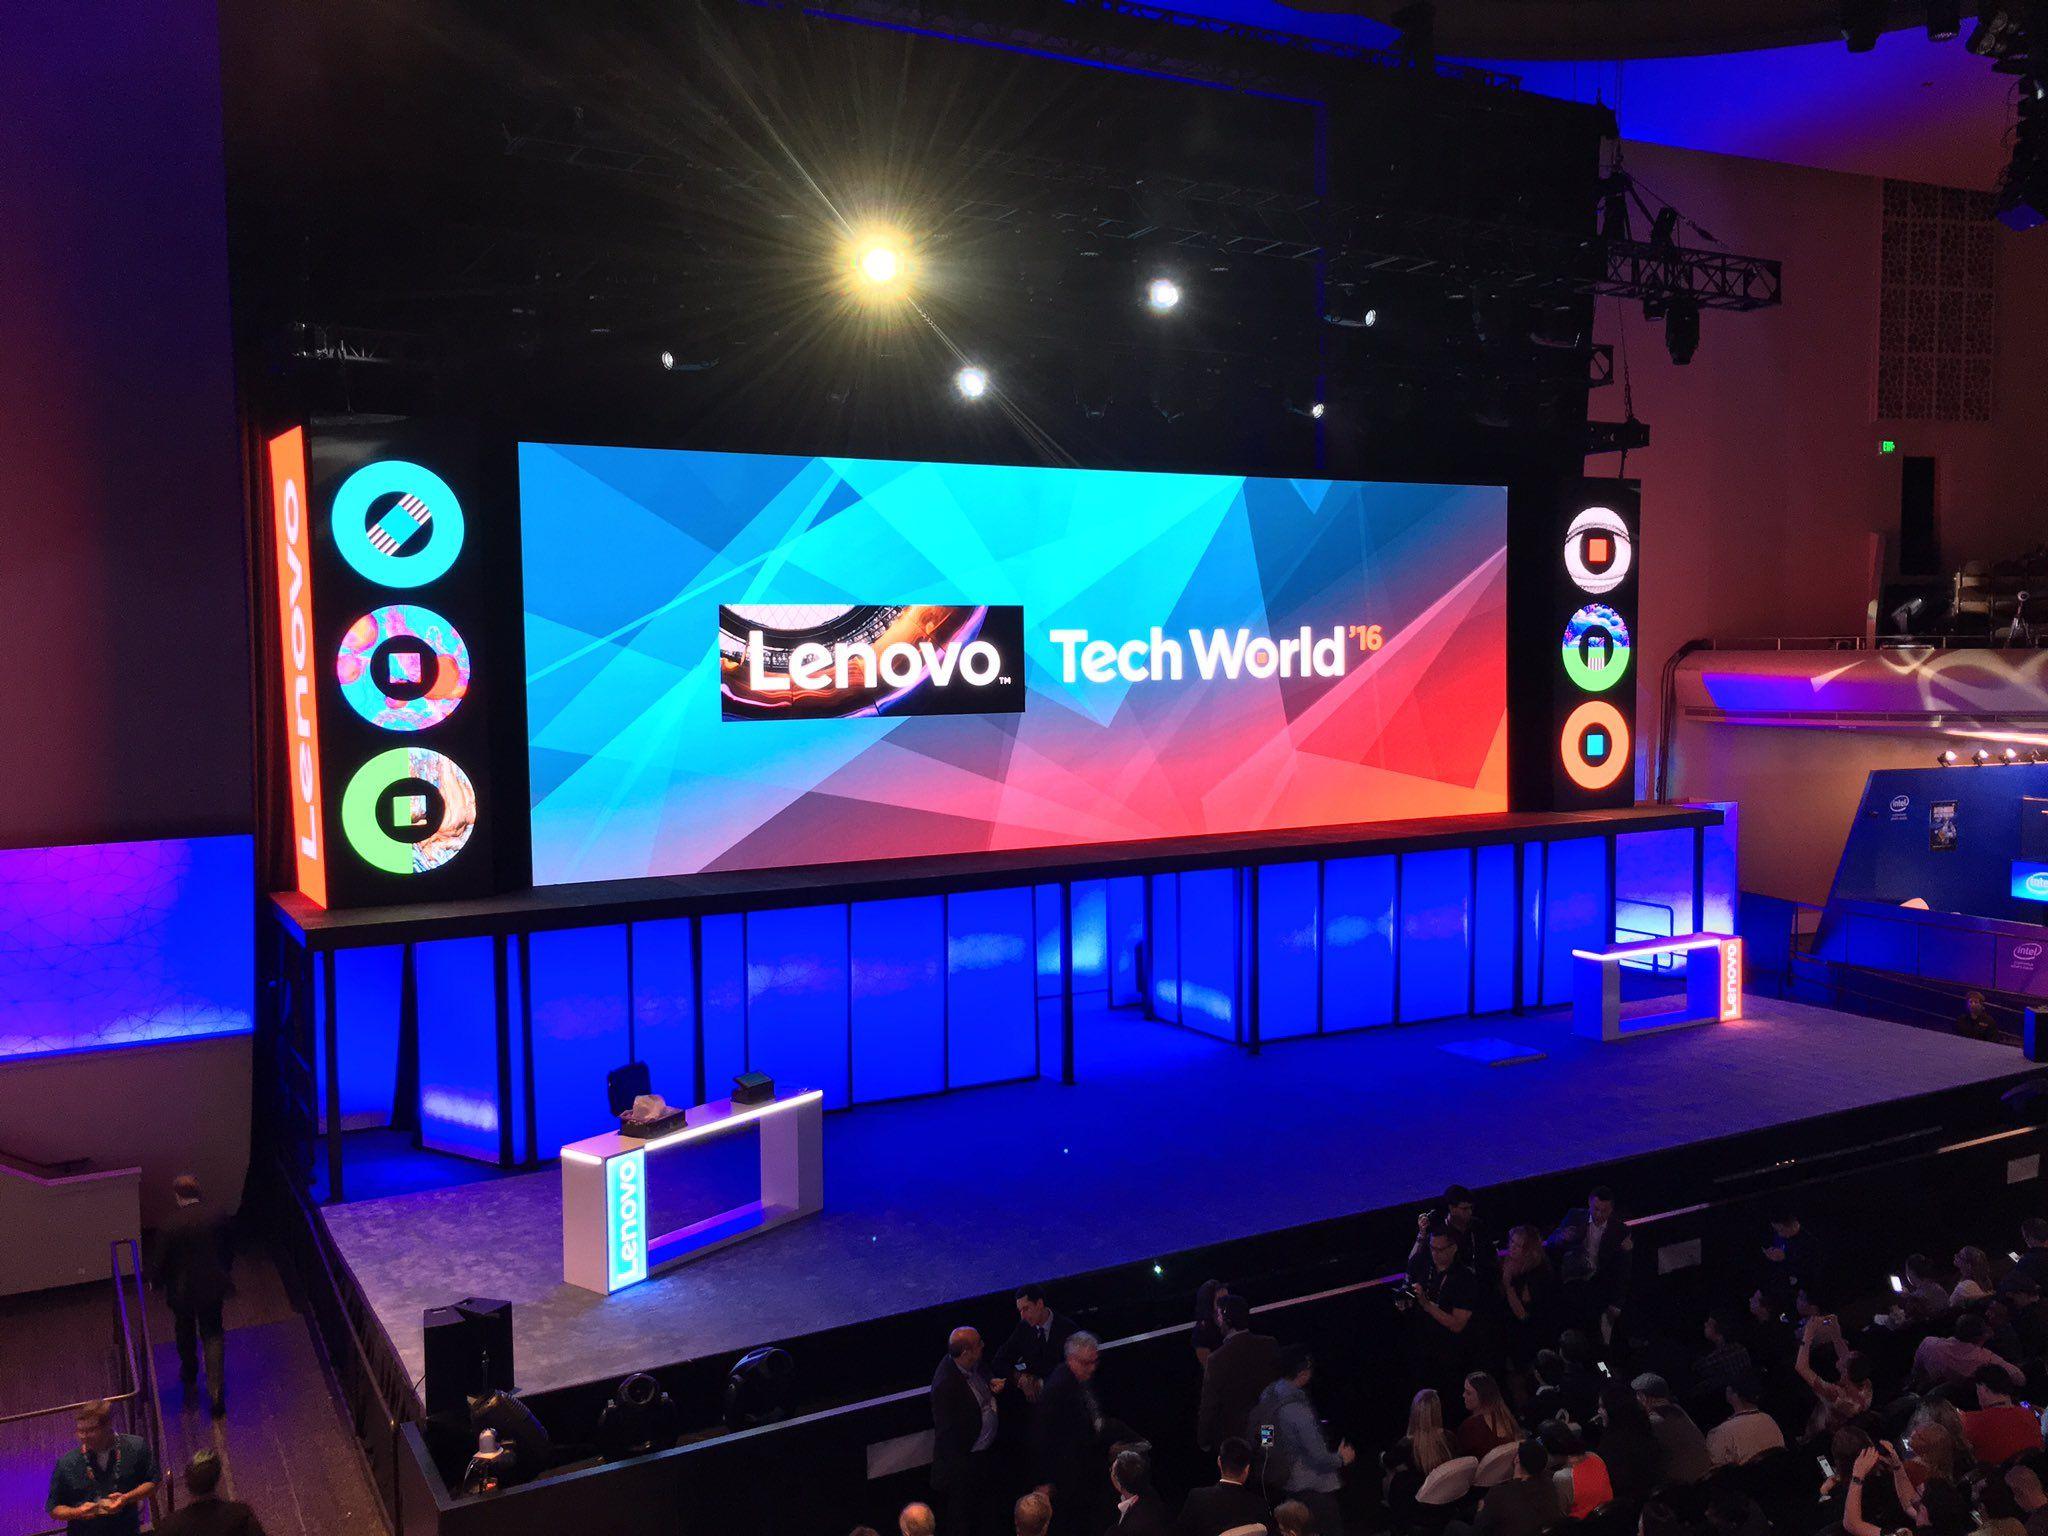 Arrancamos ahora! https://t.co/a5EKj8P5x9 #LenovoTechWorld https://t.co/nWAHHYLLLd